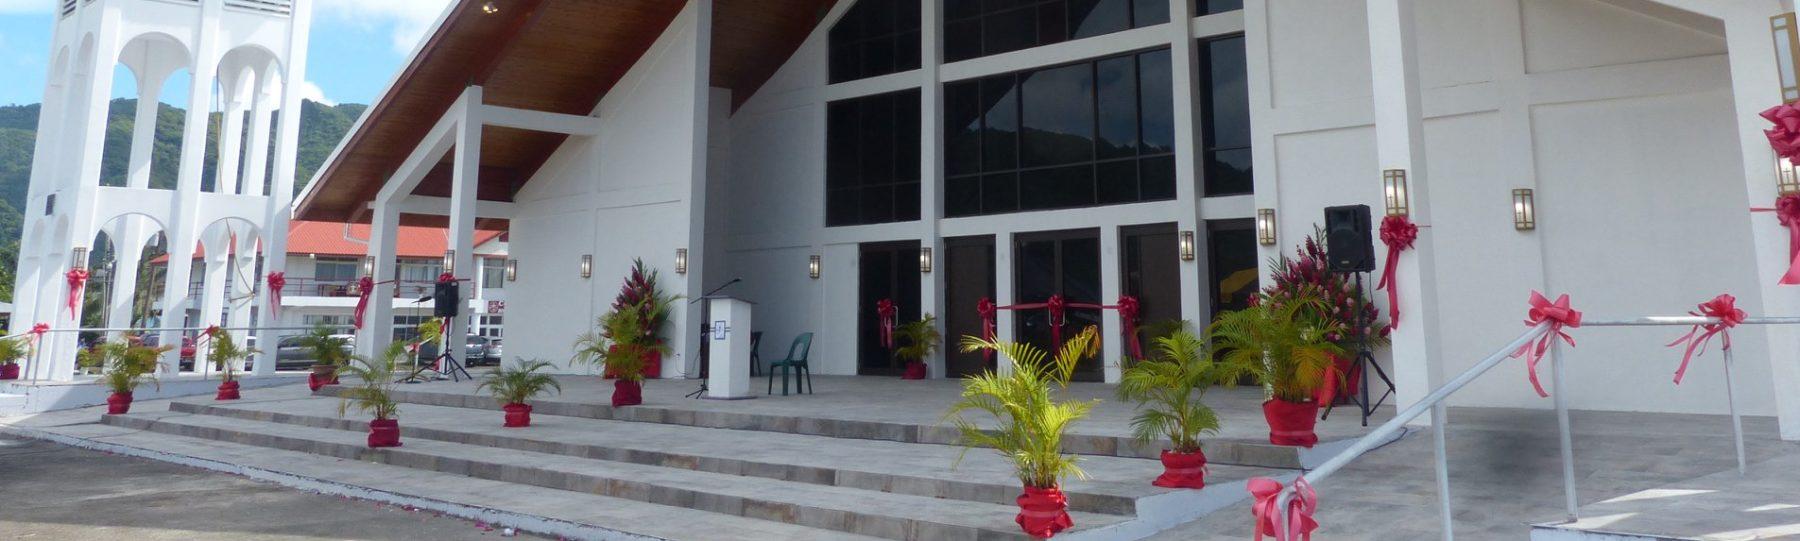 Ekalesia Faapotopotoga Kerisiano i Amerika Samoa (EFKAS)